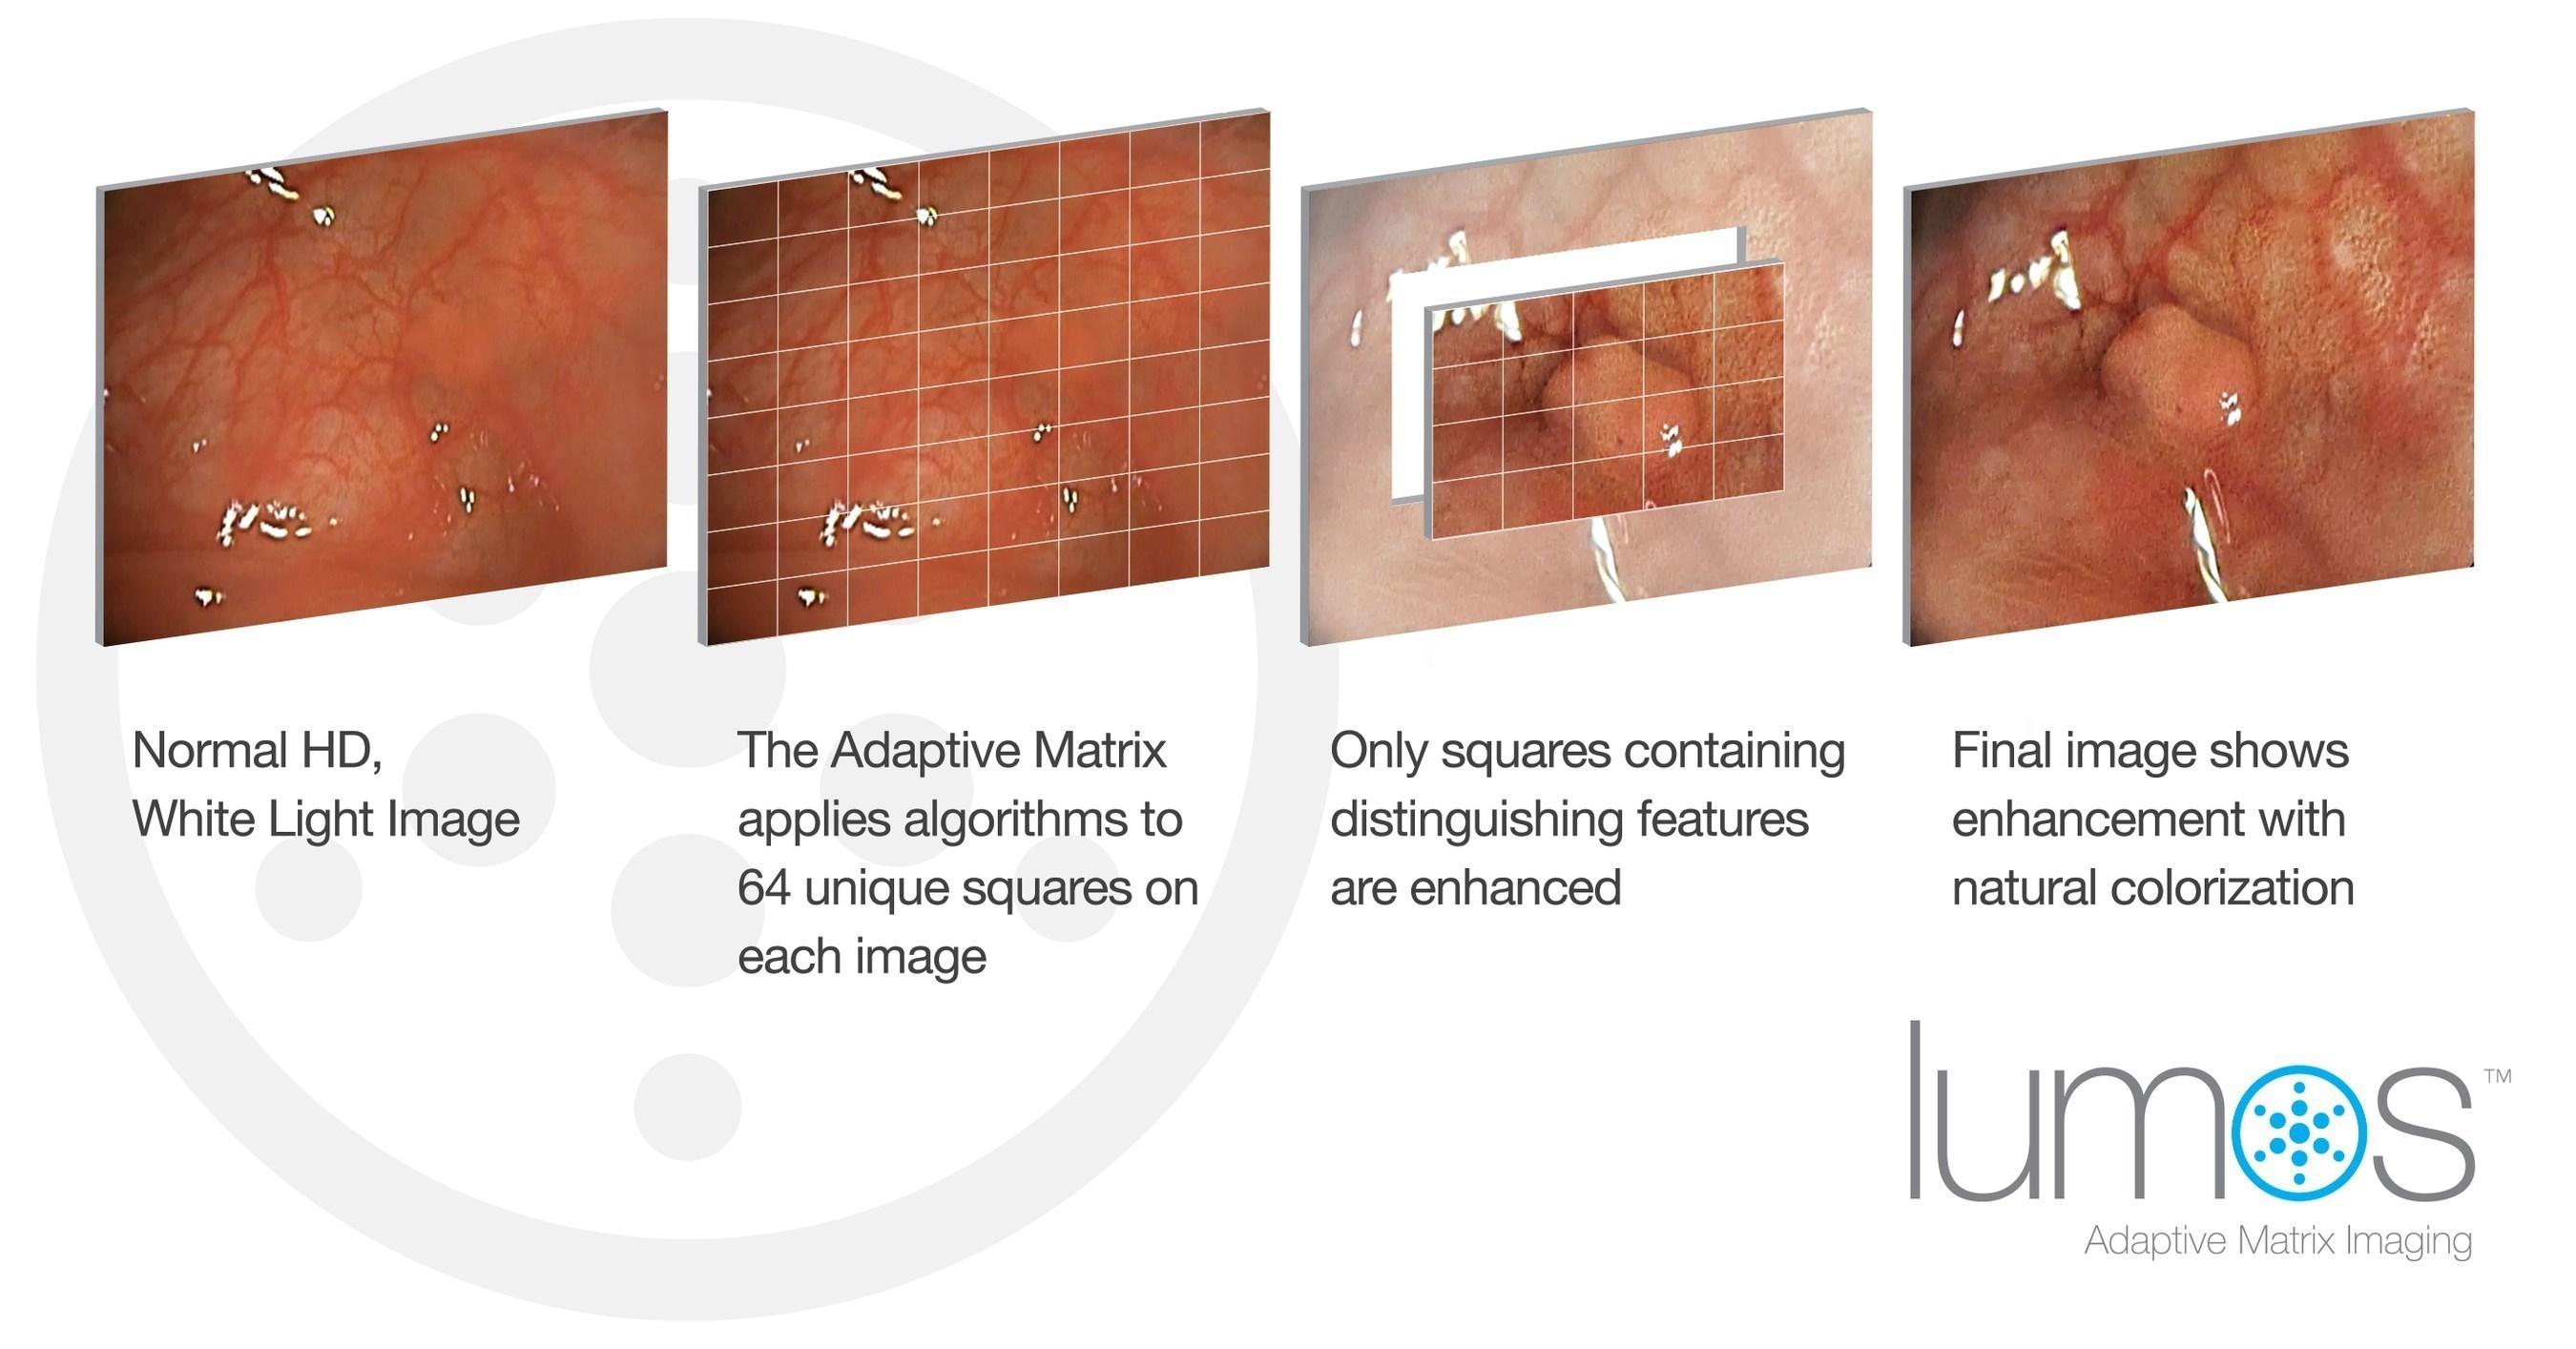 Lumos(TM) with Adaptive Matrix Imaging by EndoChoice